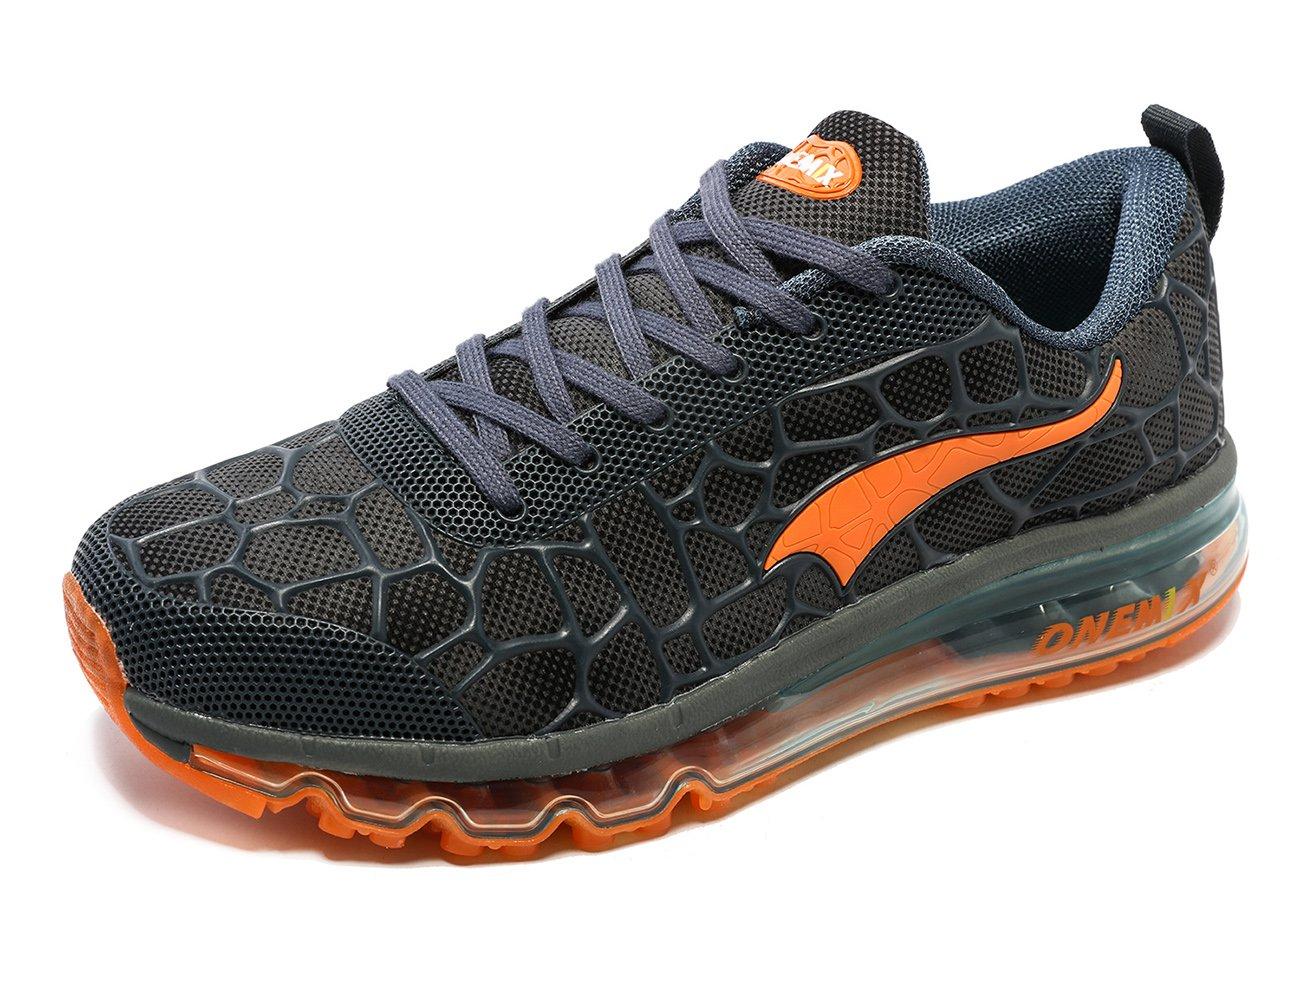 ONEMIX Men's Lightweight Air Cushion Sport Running Shoes B078B7Q4C6 8 D(M) US|Blue/Orange